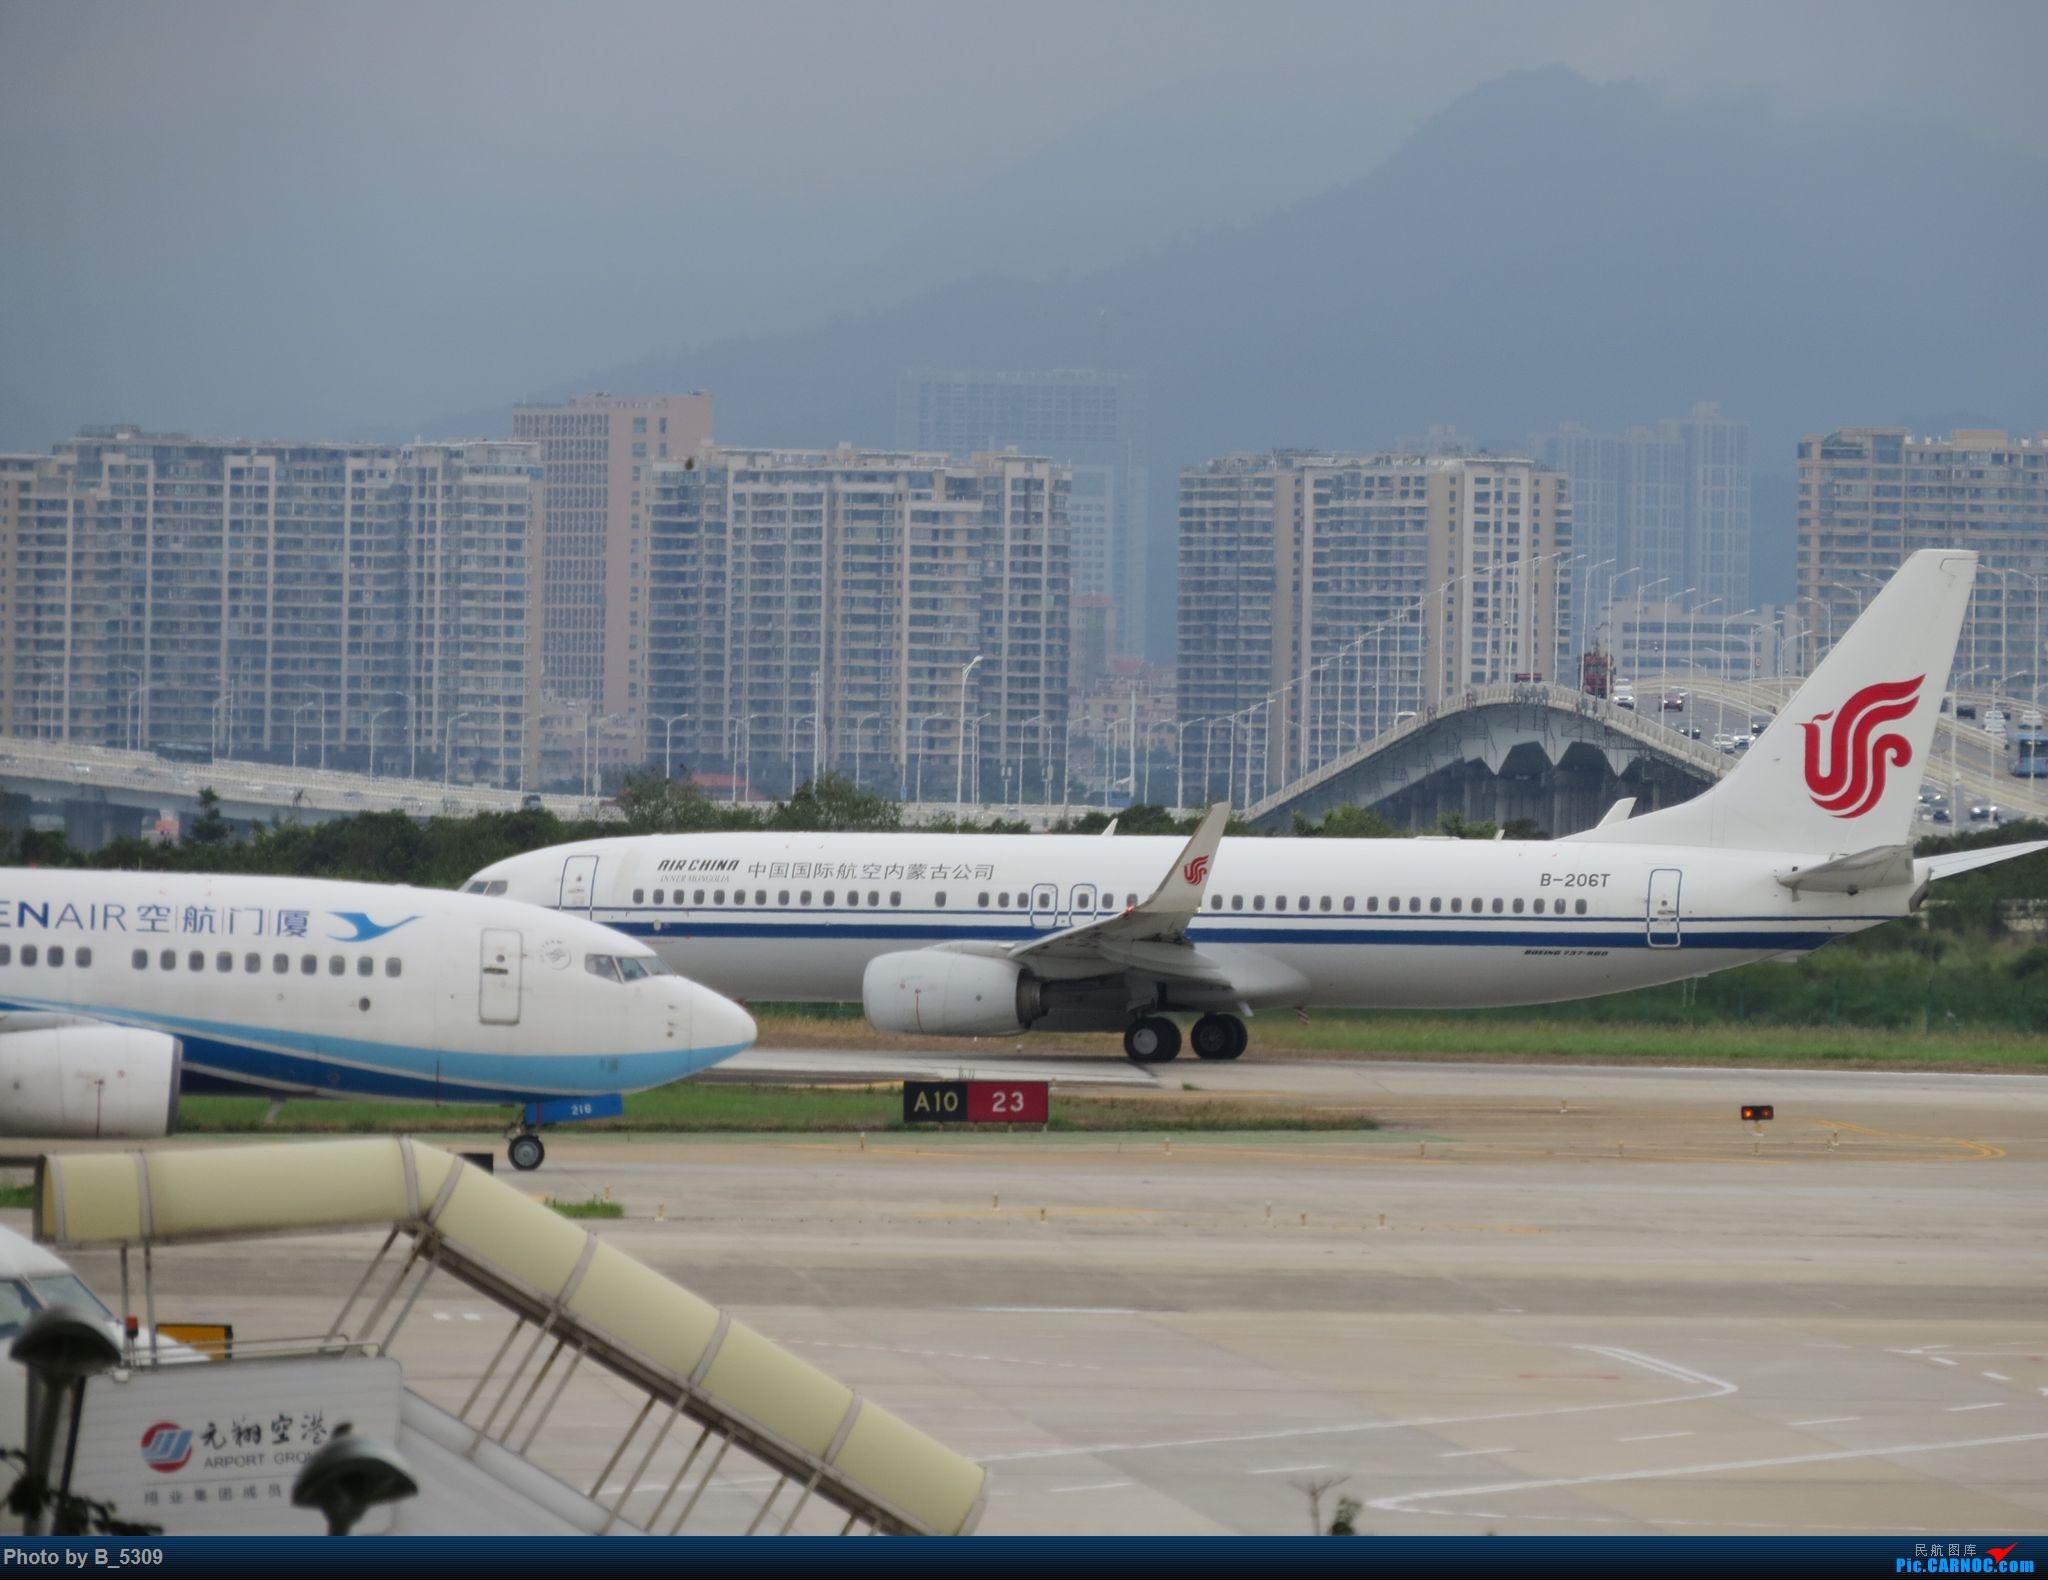 Re:[原创]复课一个月了,终于能在紧张的学习生活中抽出点时间拍稽~ BOEING 737-800 B-206T 中国厦门高崎国际机场